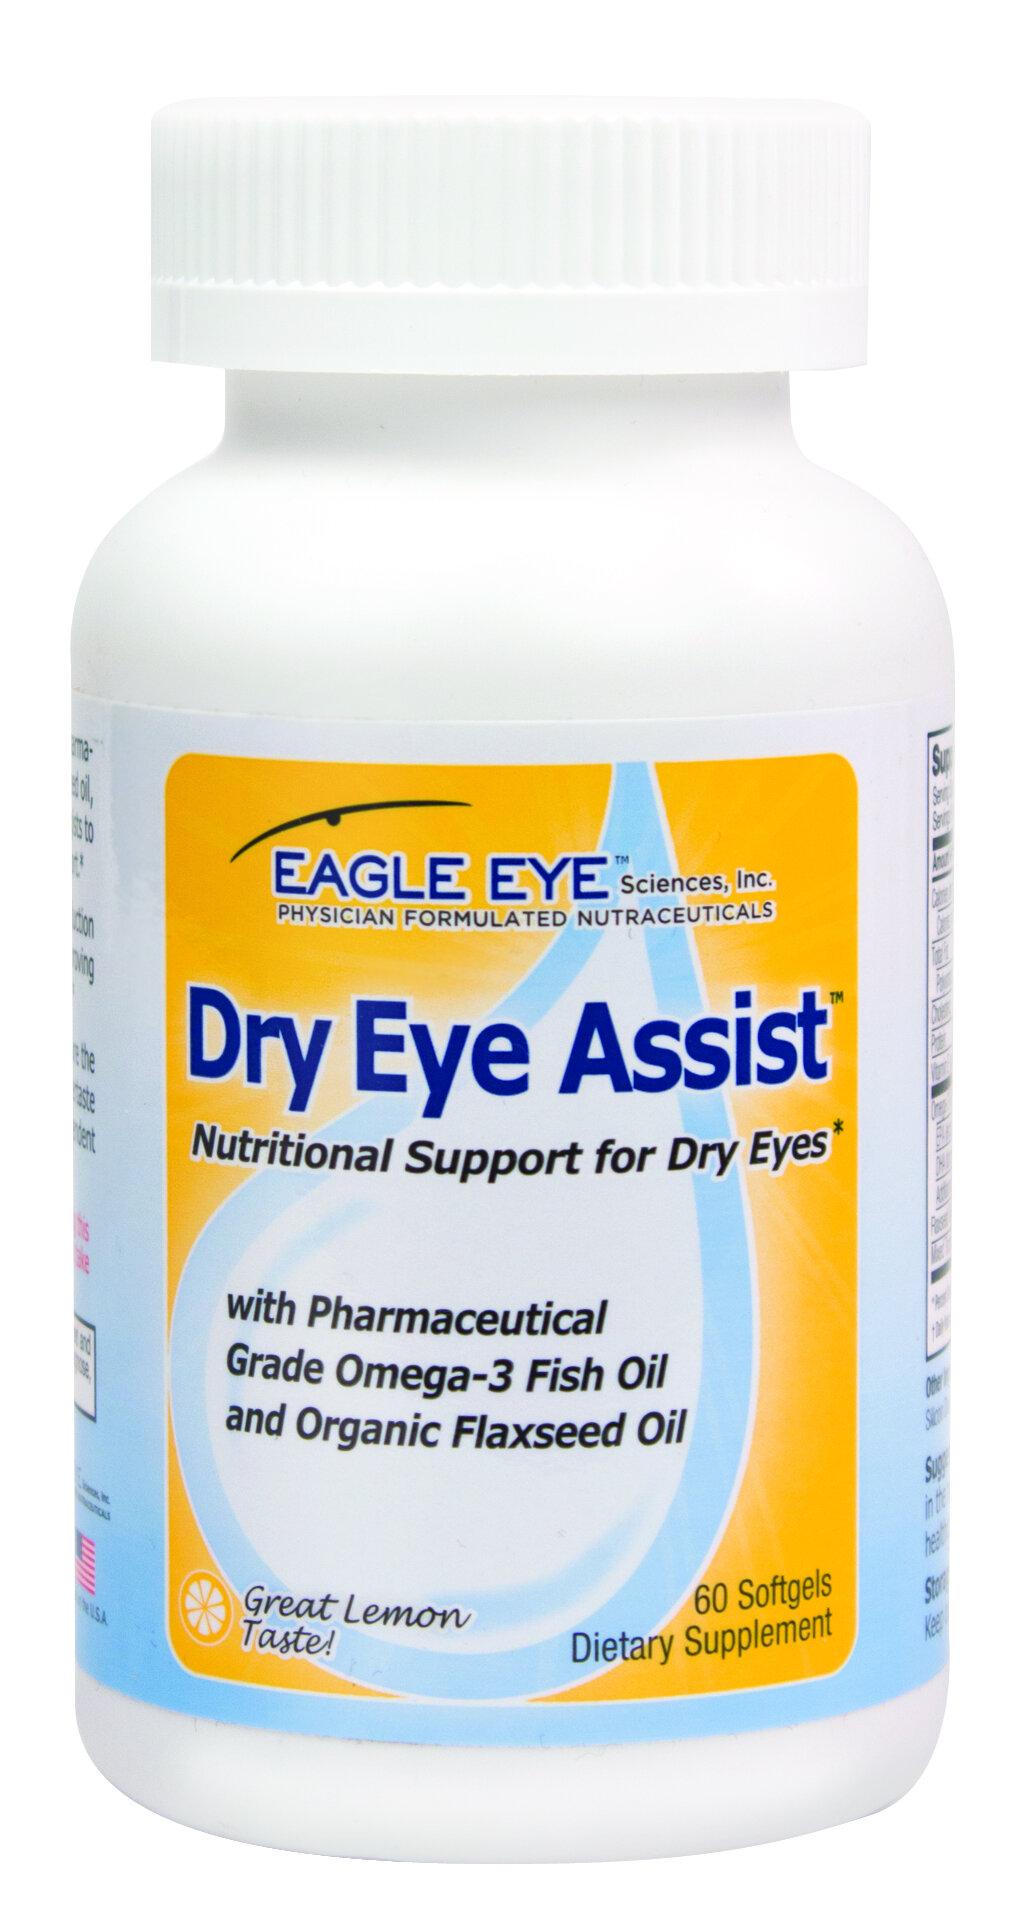 Eagle Eye Sciences on Twitter: